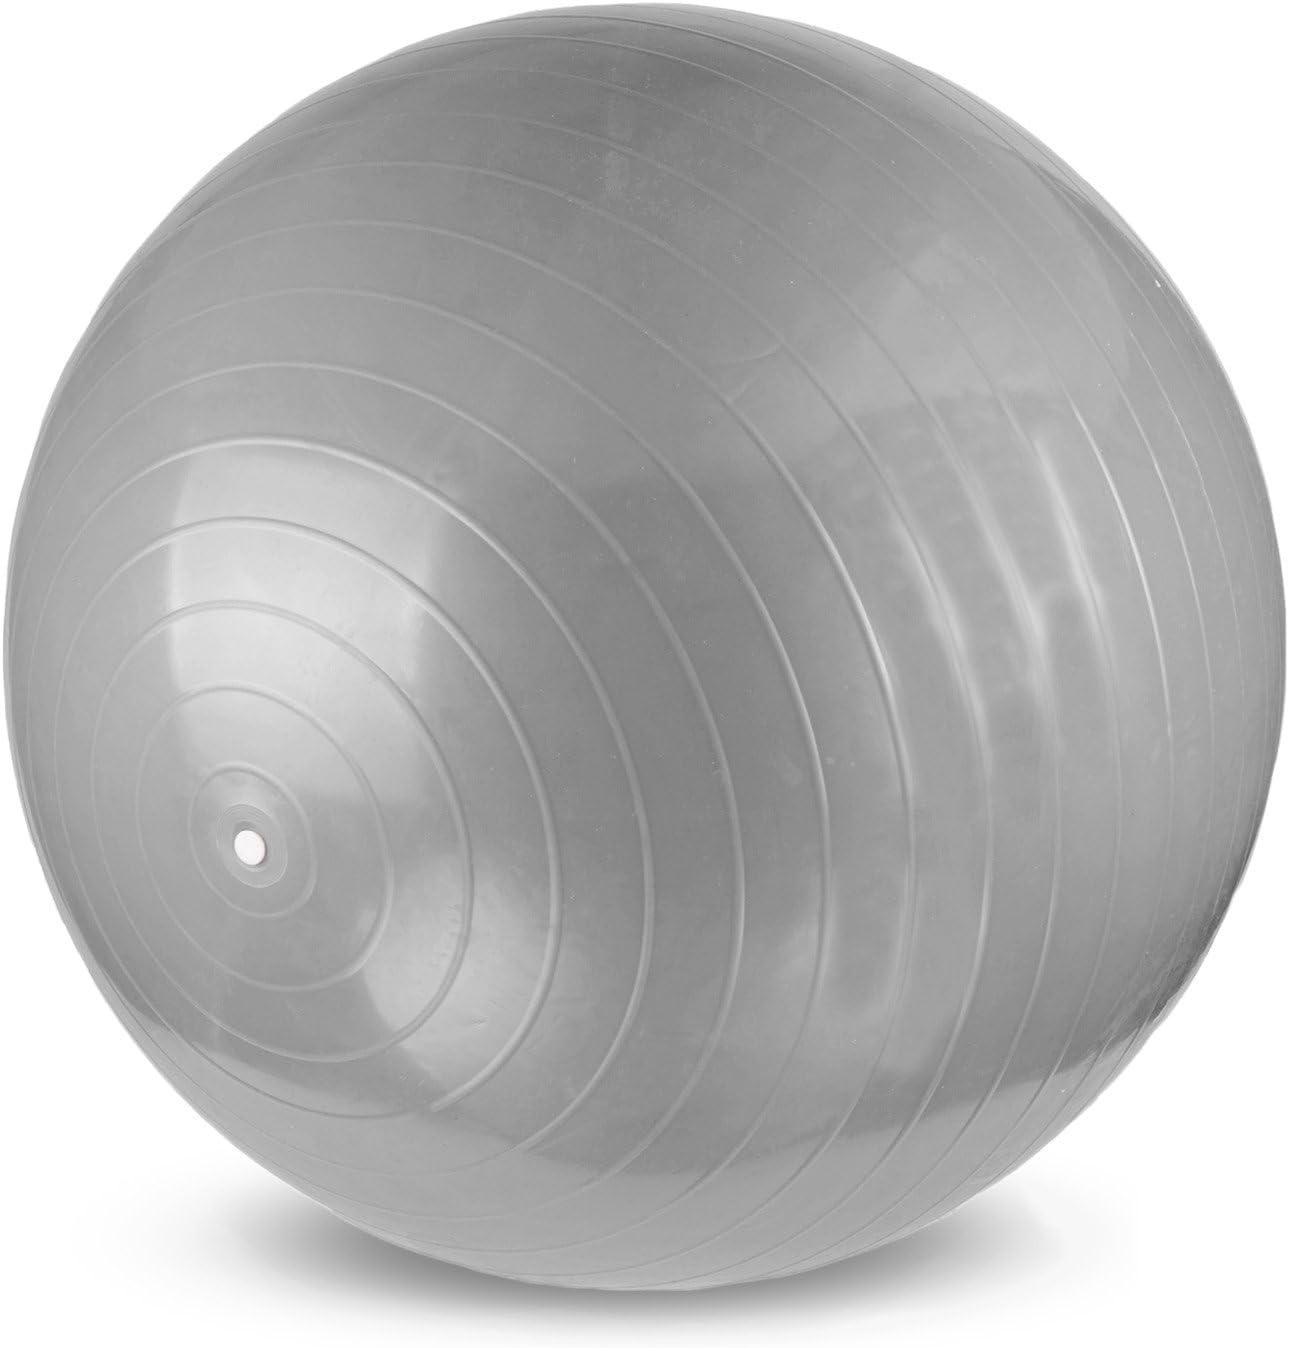 YogaAccessories Anti 25% OFF Tulsa Mall Burst and Slip Swiss fo Yoga Resistant Ball